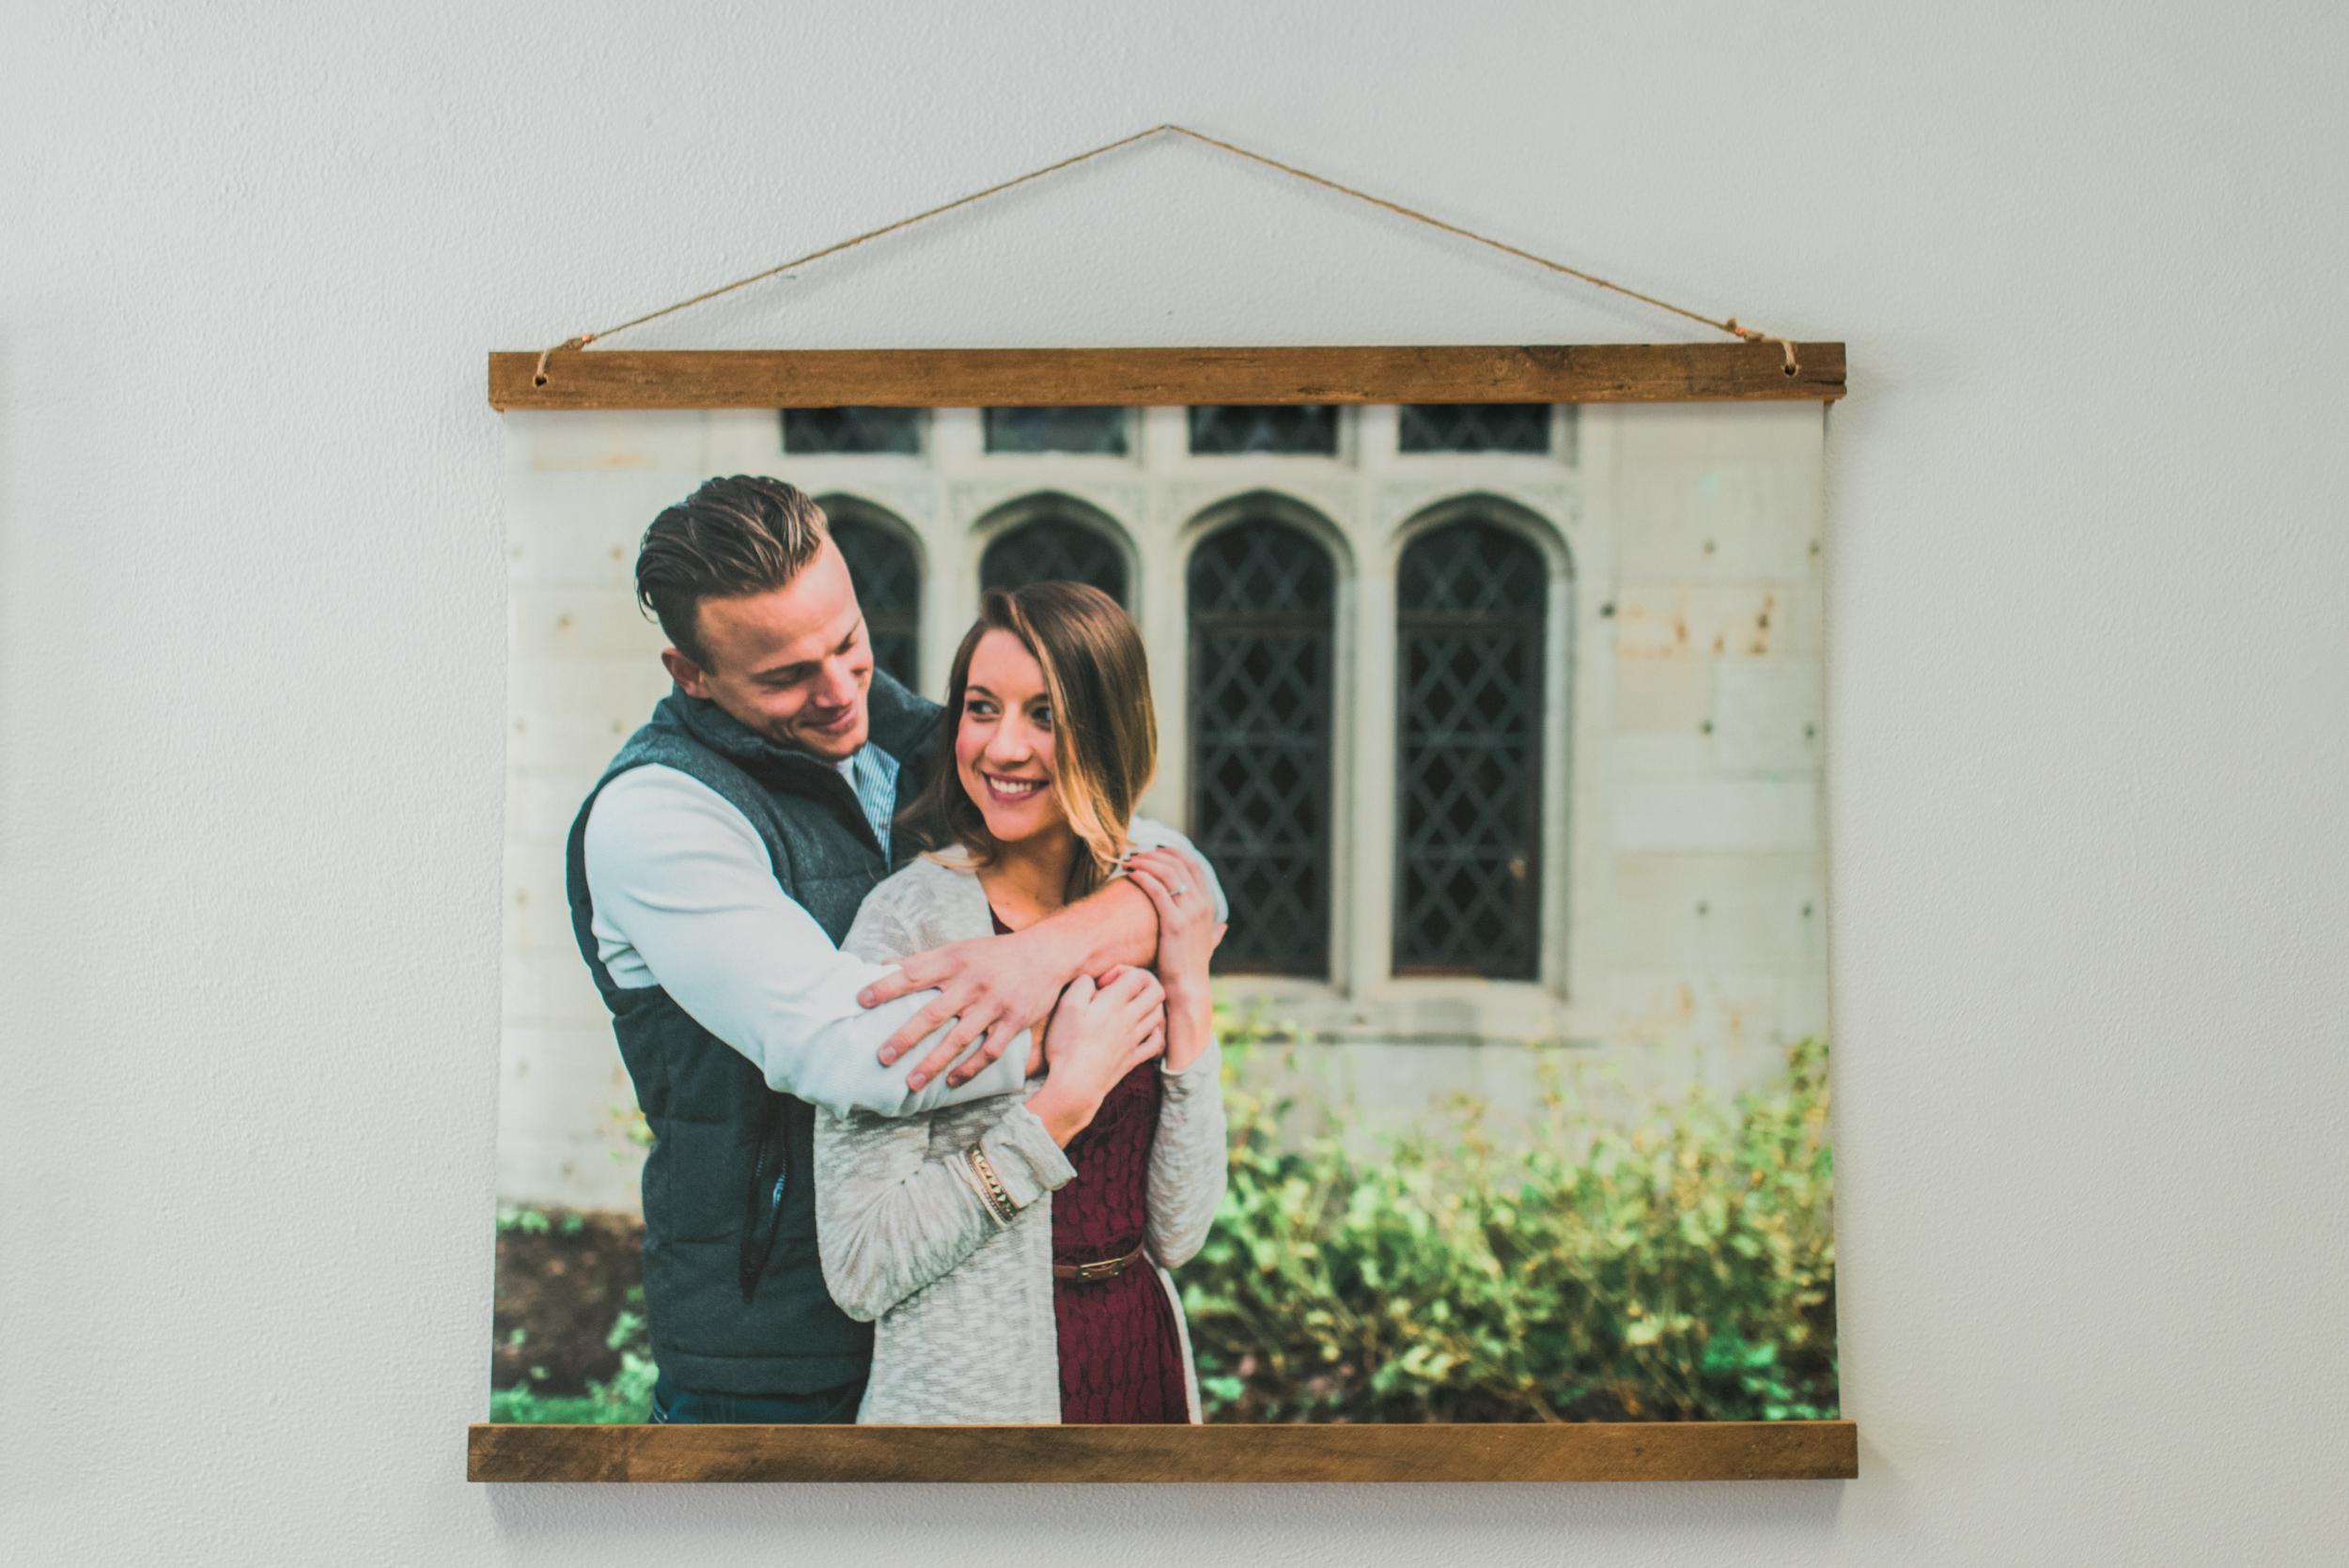 Pittsburgh wedding photographer, pittsburgh portraits, fine art products image 15